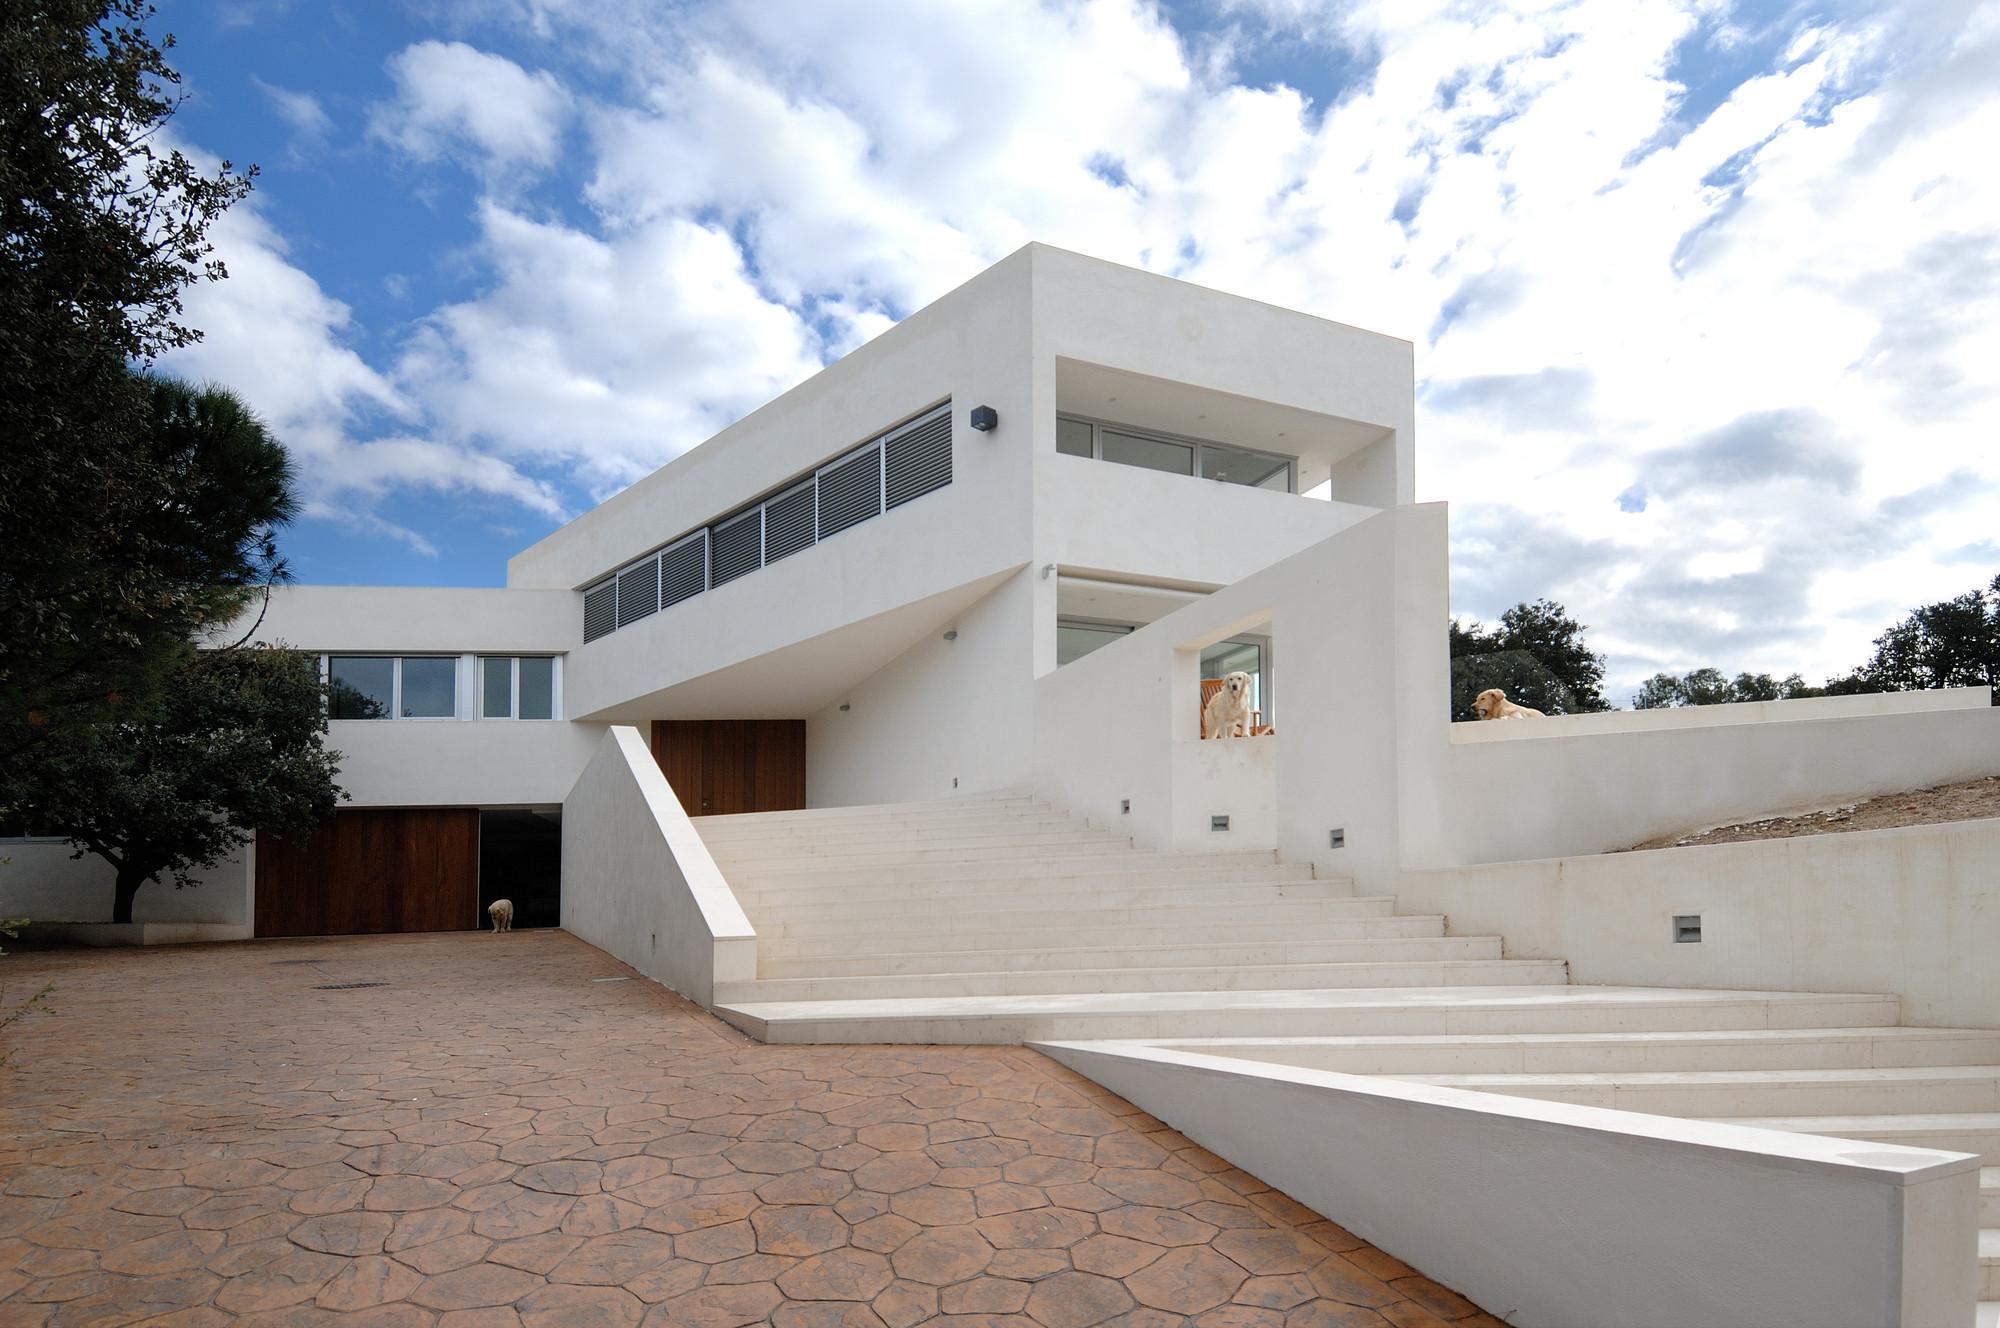 Housing in Valdemorillo / Otto Medem de la Torriente